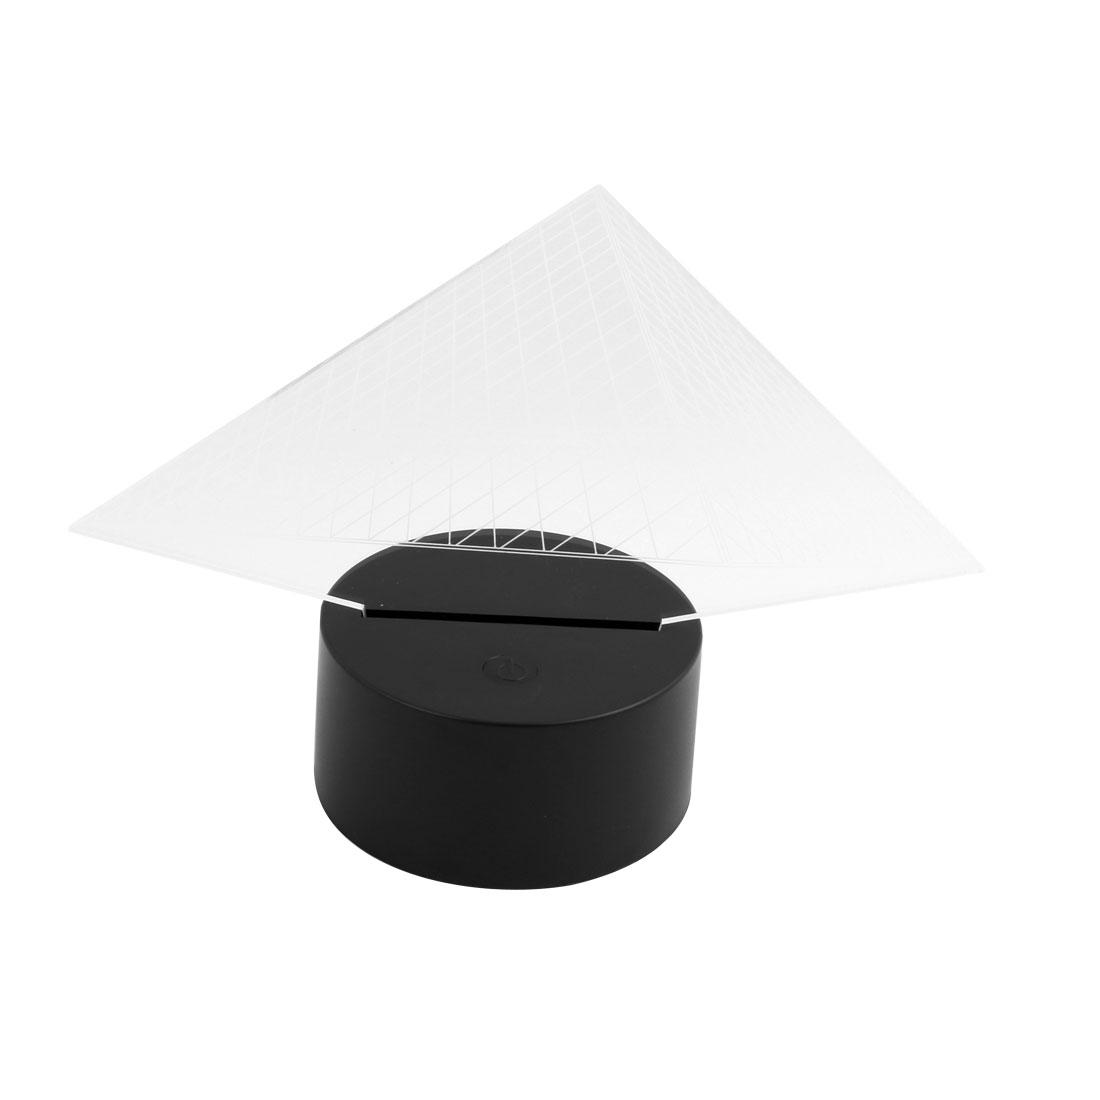 DC 5V Pyramid Shape 3D Acrylic LED Night Light 7 Color Change Desk Table Lamp